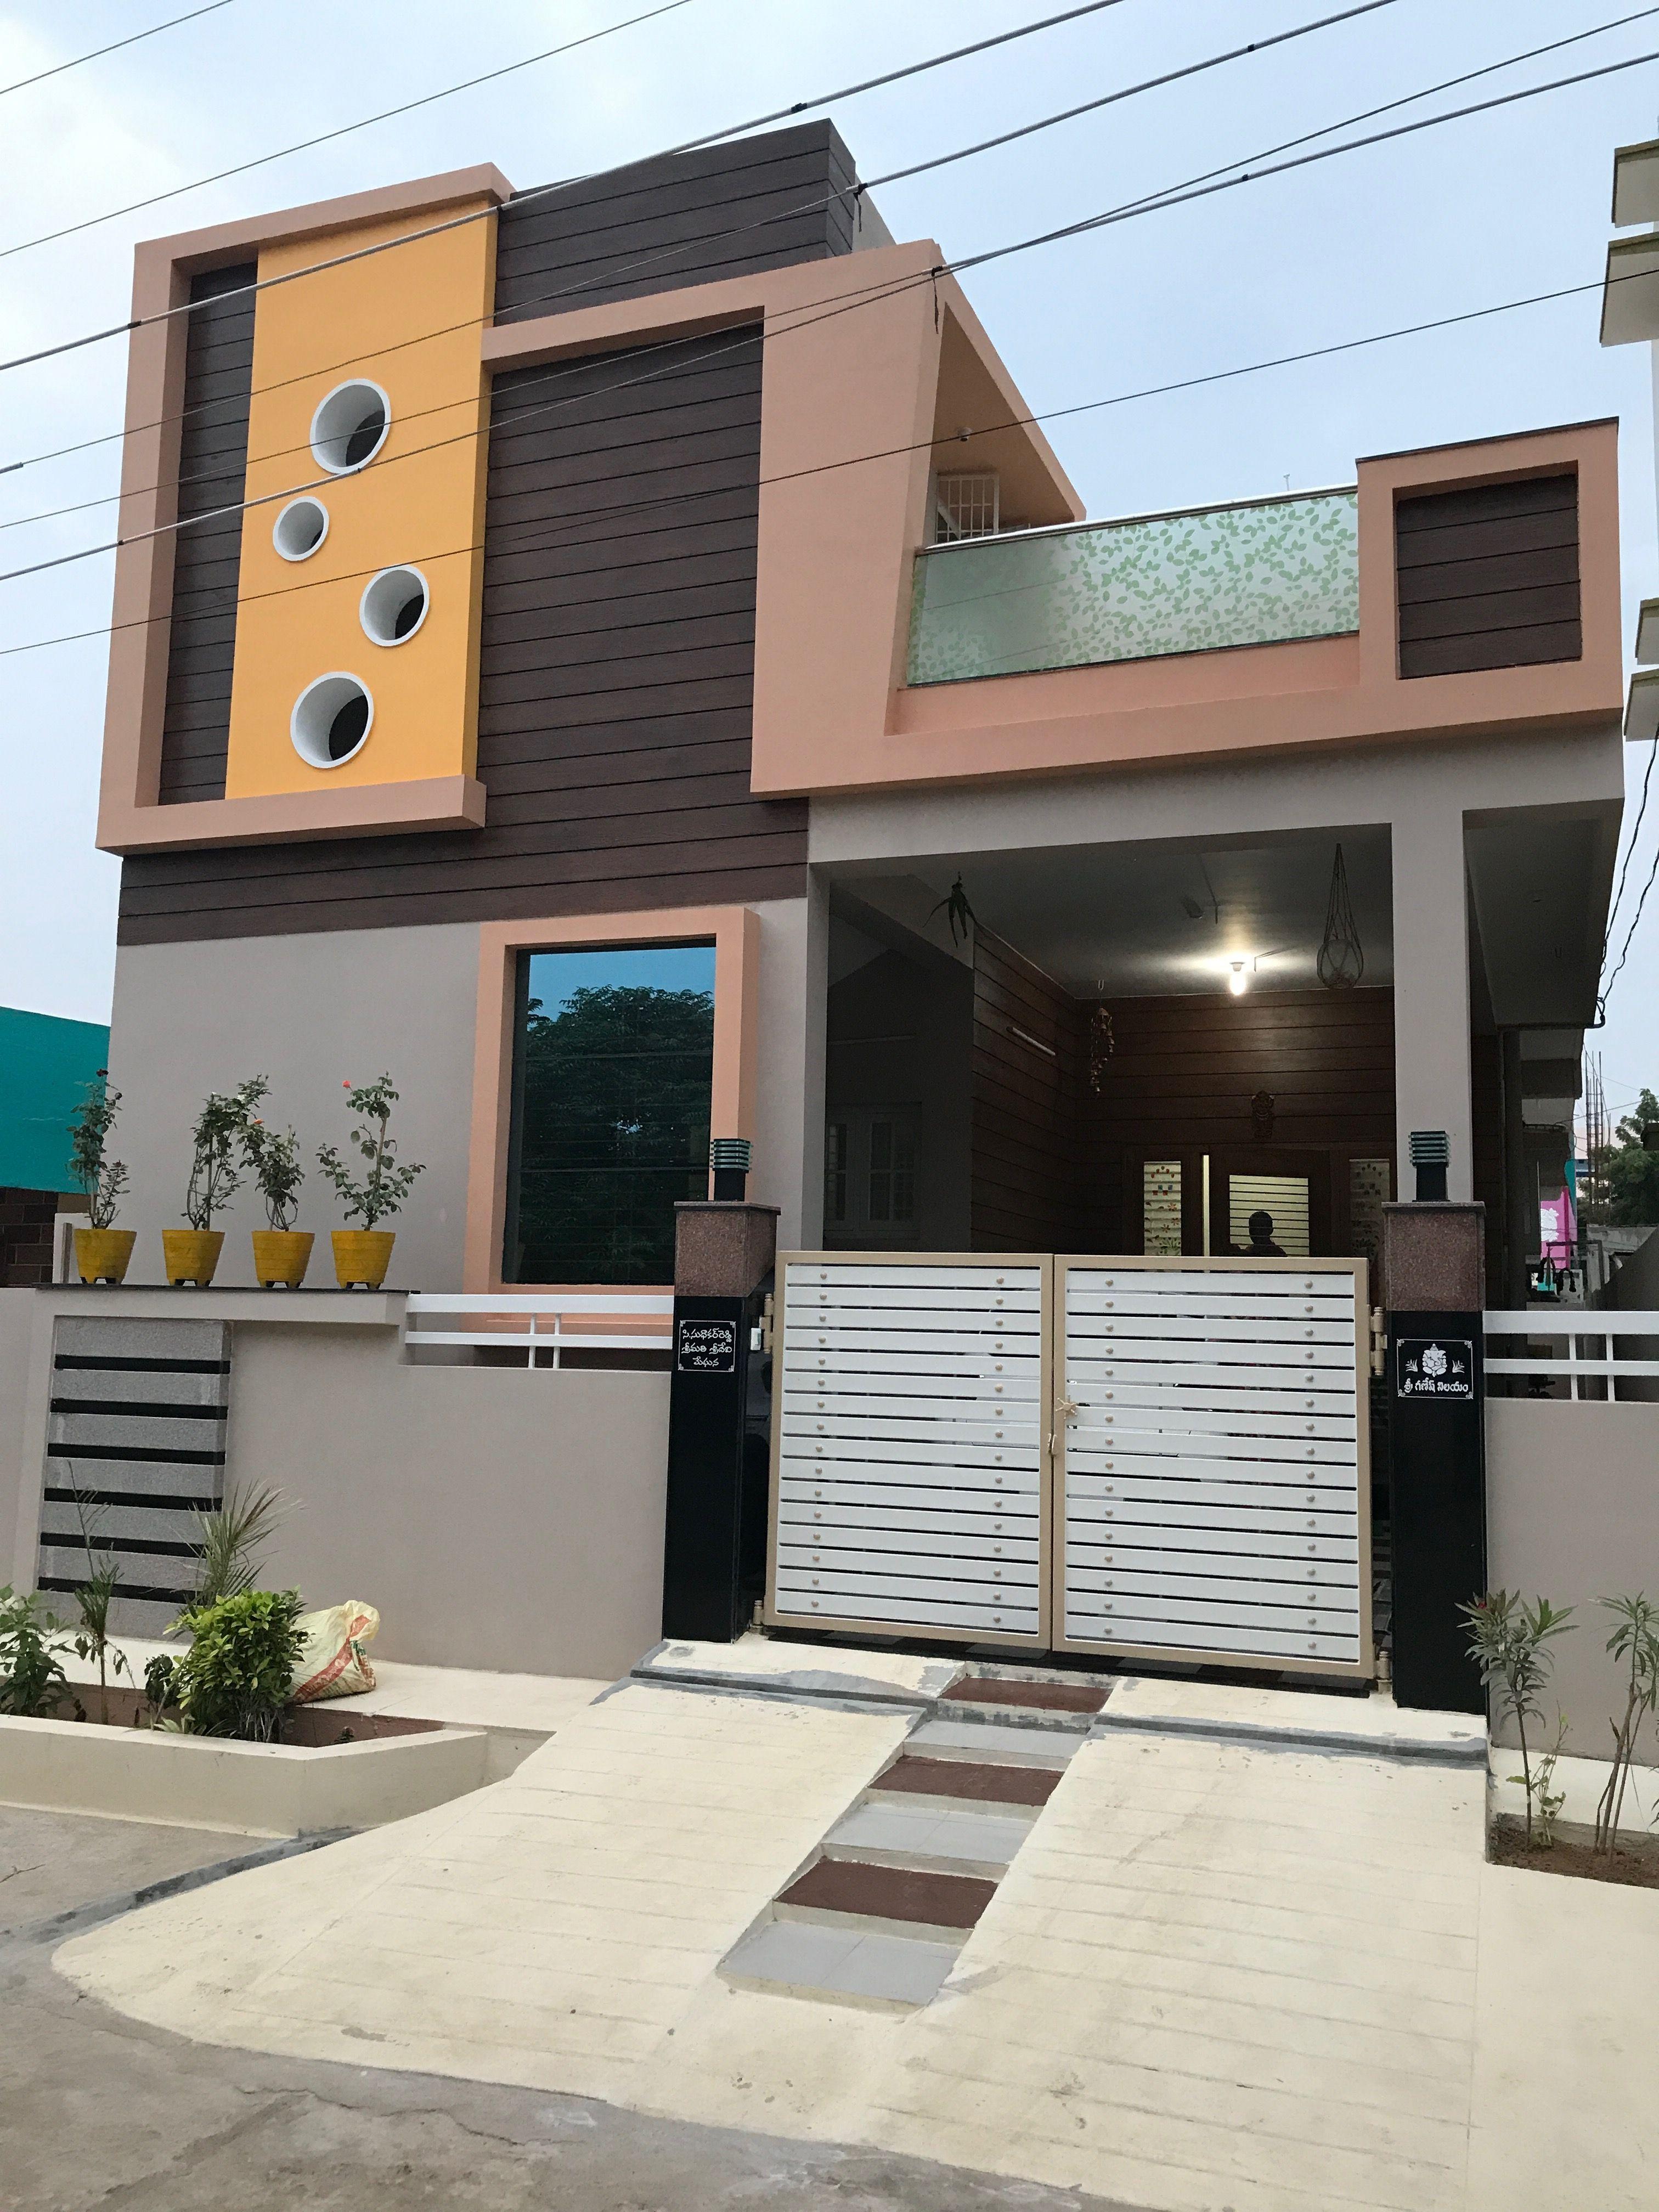 Modern house plans dream design building elevation also yerlanki sankara on pinterest rh